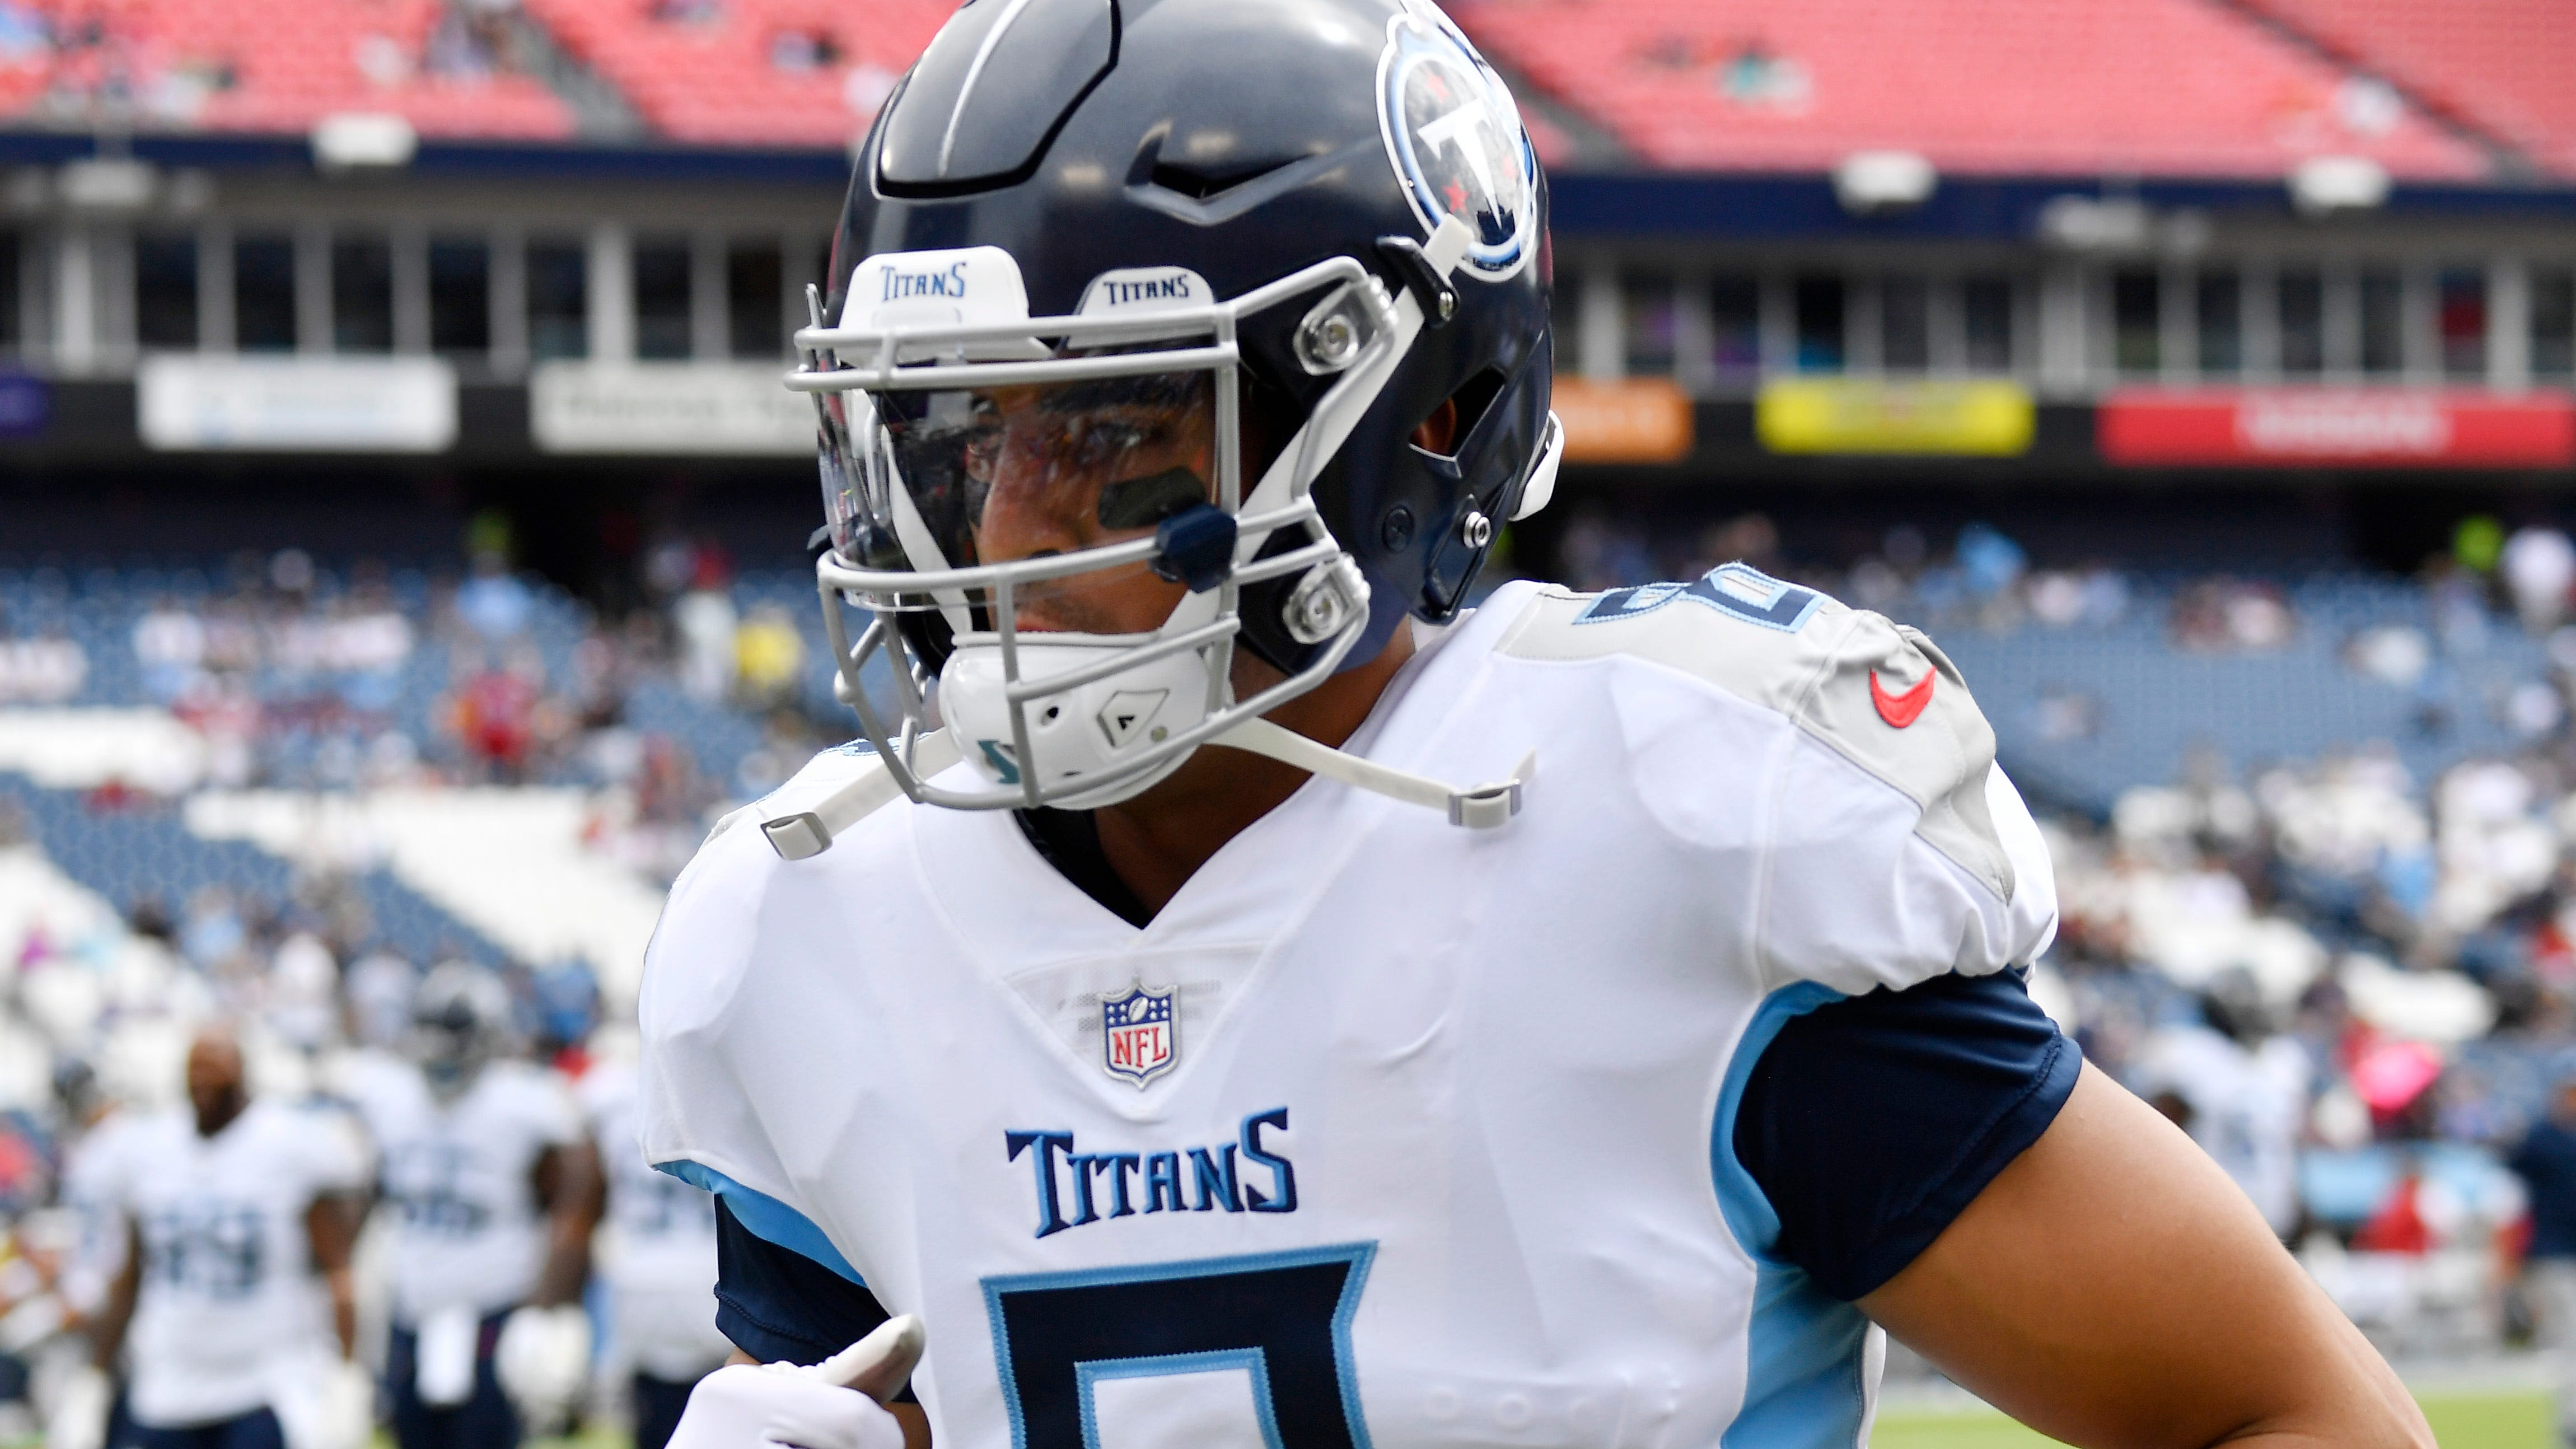 Titans quarterback Marcus Mariota (8) jogs on the field before the game at Nissan Stadium Sunday, Sept. 16, 2018, in Nashville, Tenn.